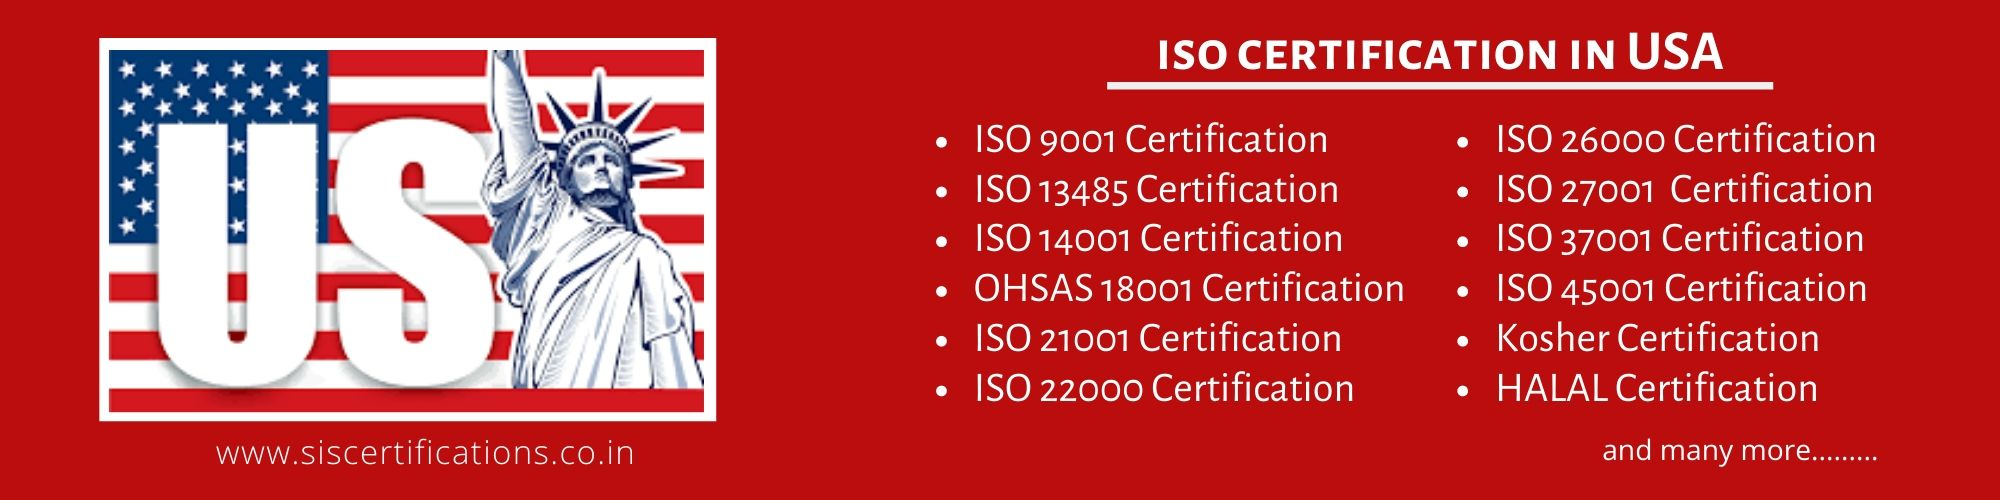 ISO 9001 Certification in USA , ISO 9001 Certification in USA